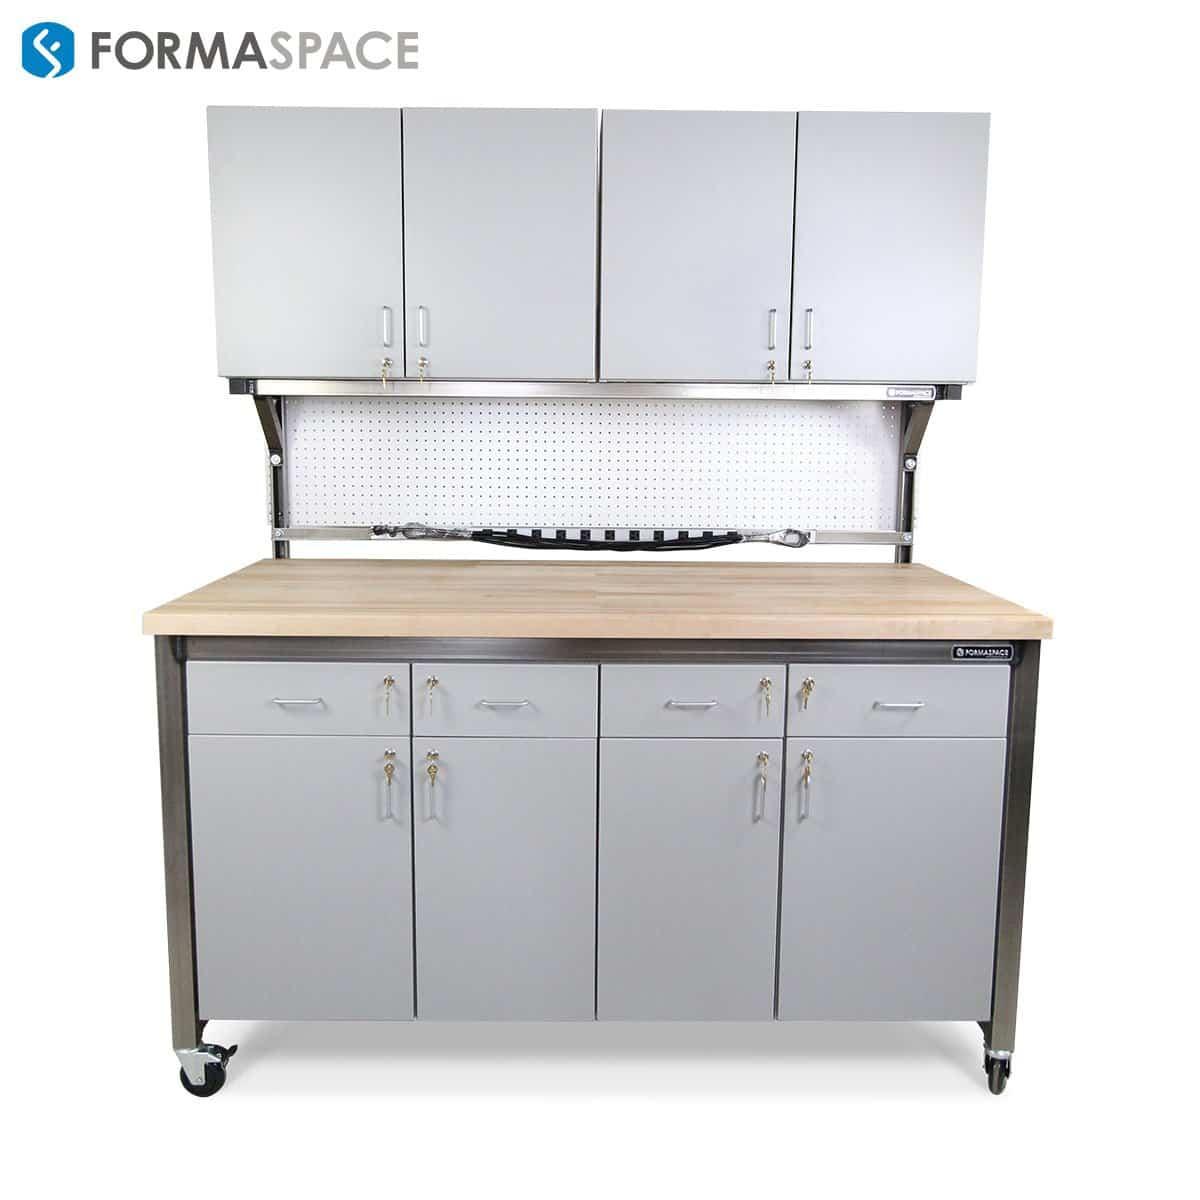 benchmarx workbench locking cabinets